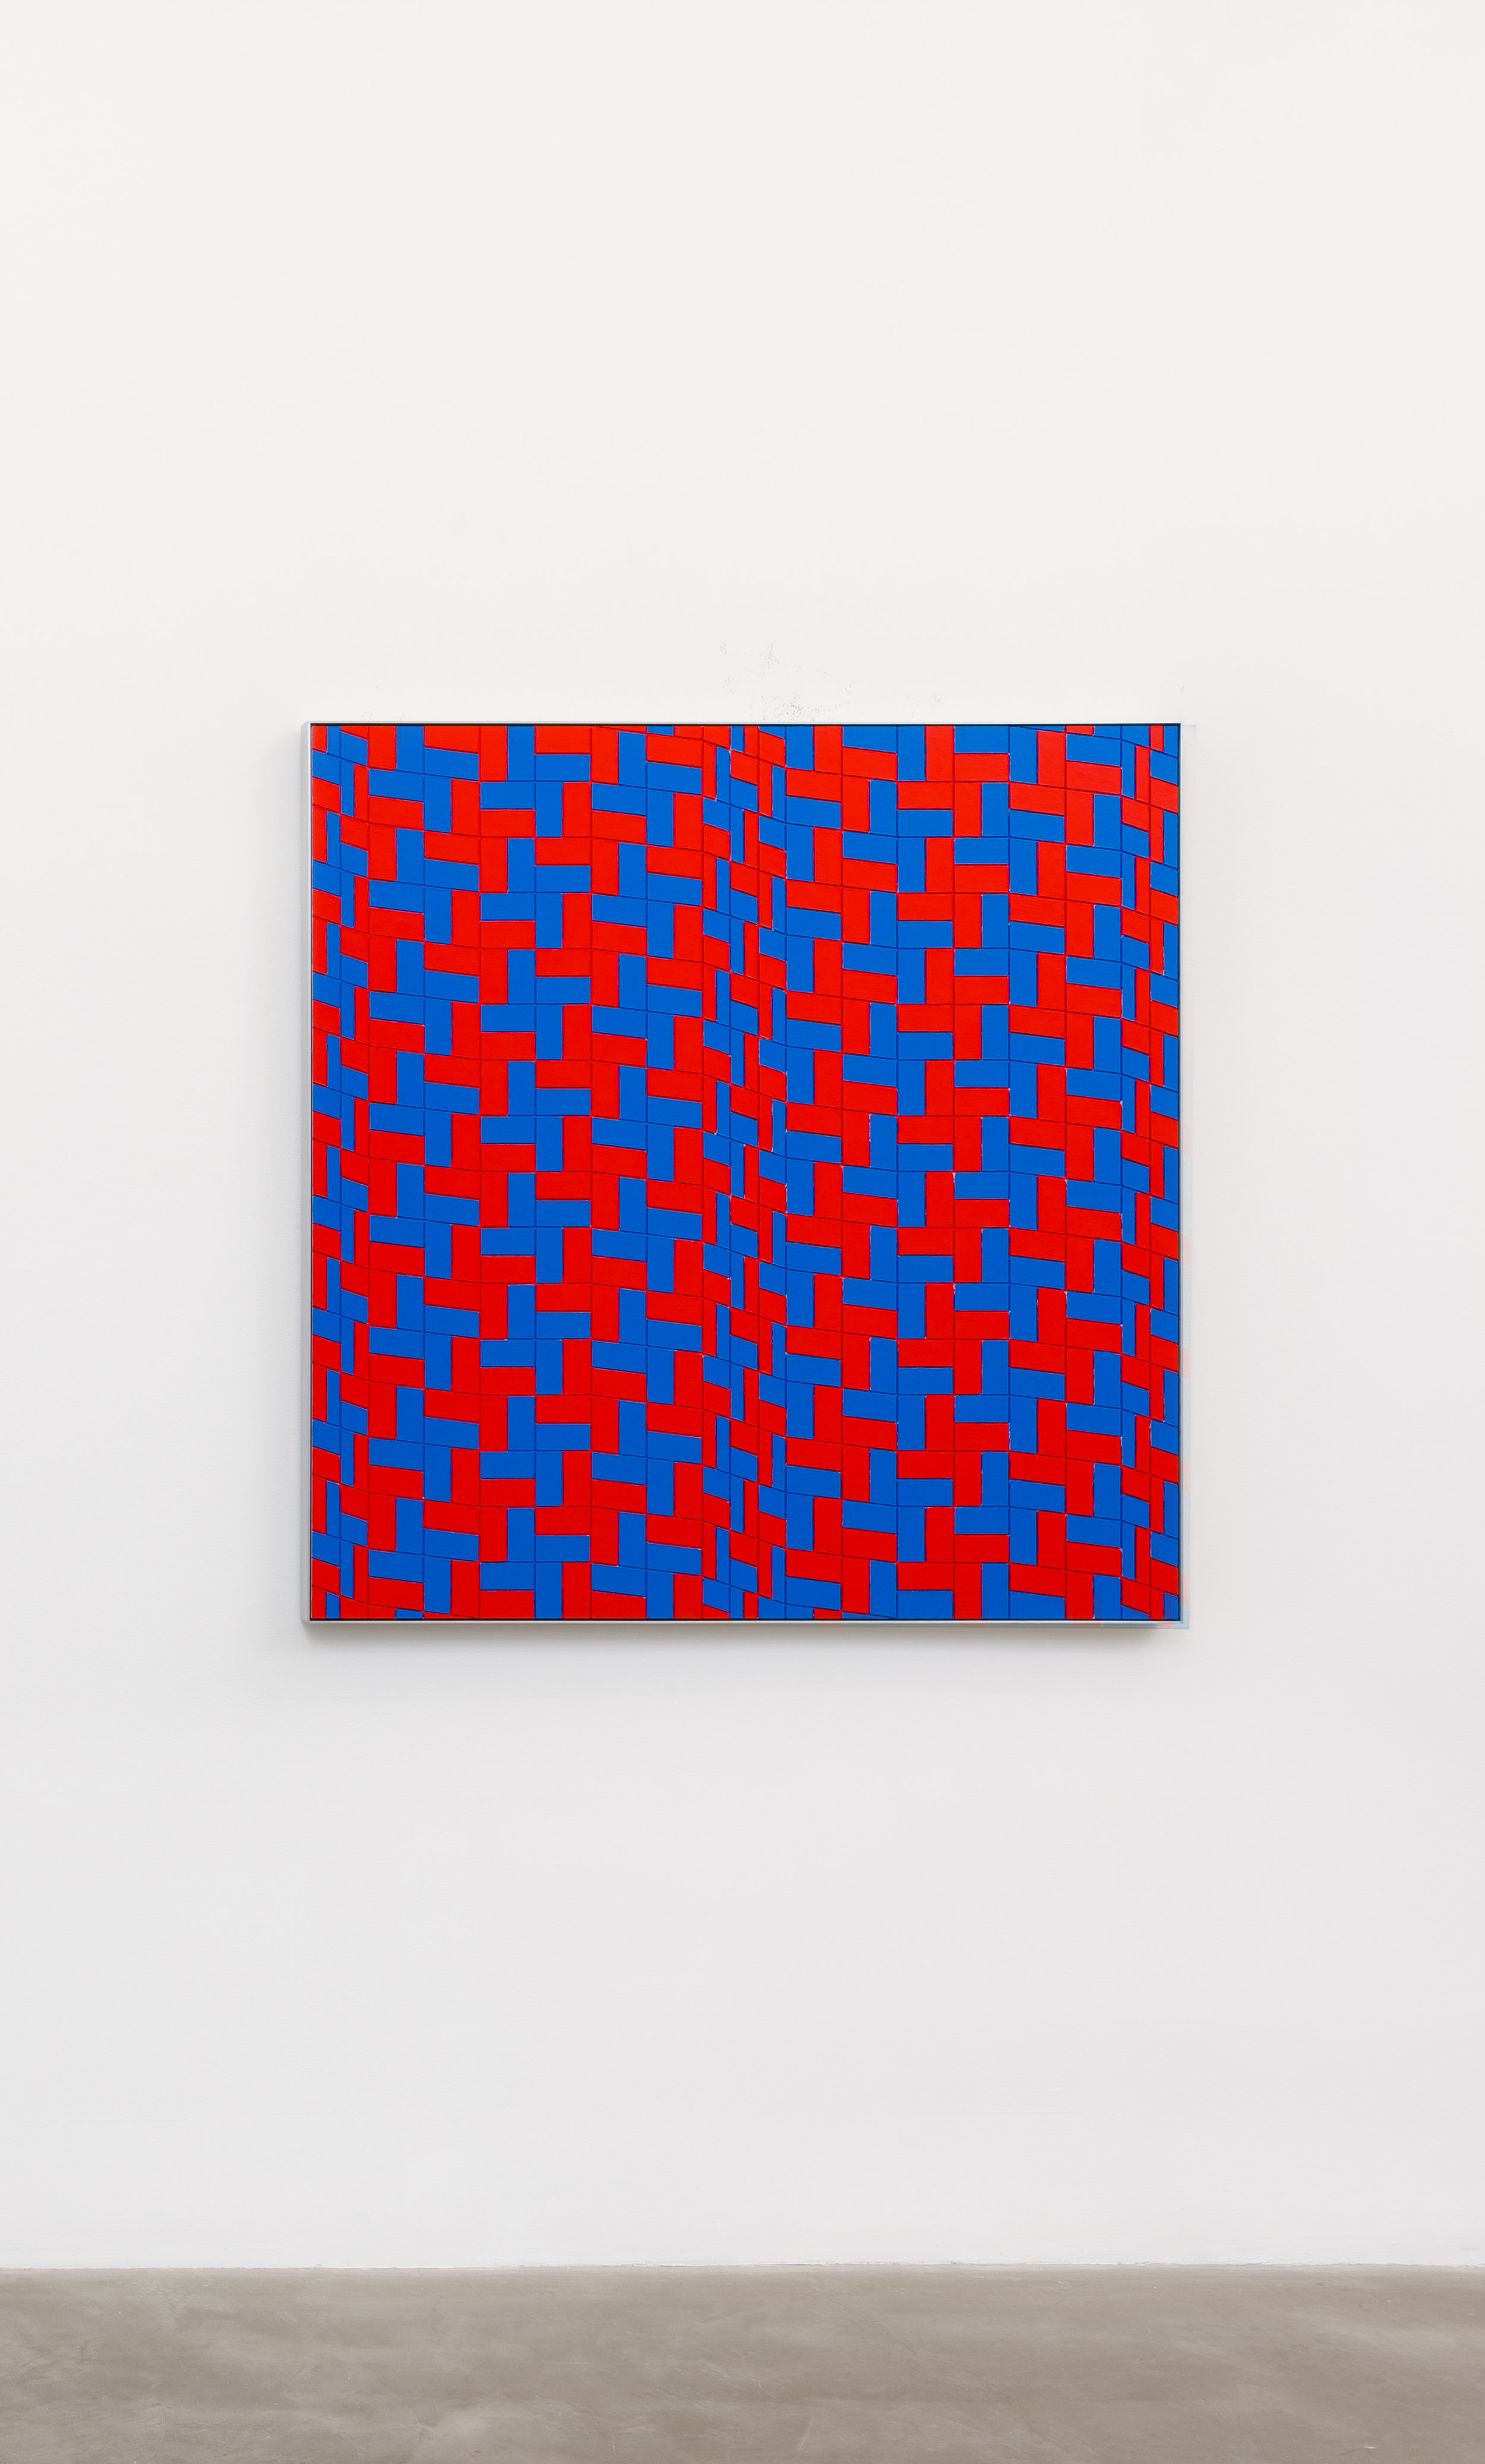 Jim Isermann, Untitled (0115), 2015 acrylic latex paint on computer numerical control milled medium-density fibreboard panel with aluminum frame 122 x 118 x 5 cm - 48 x 46 1/2 x 2 inches